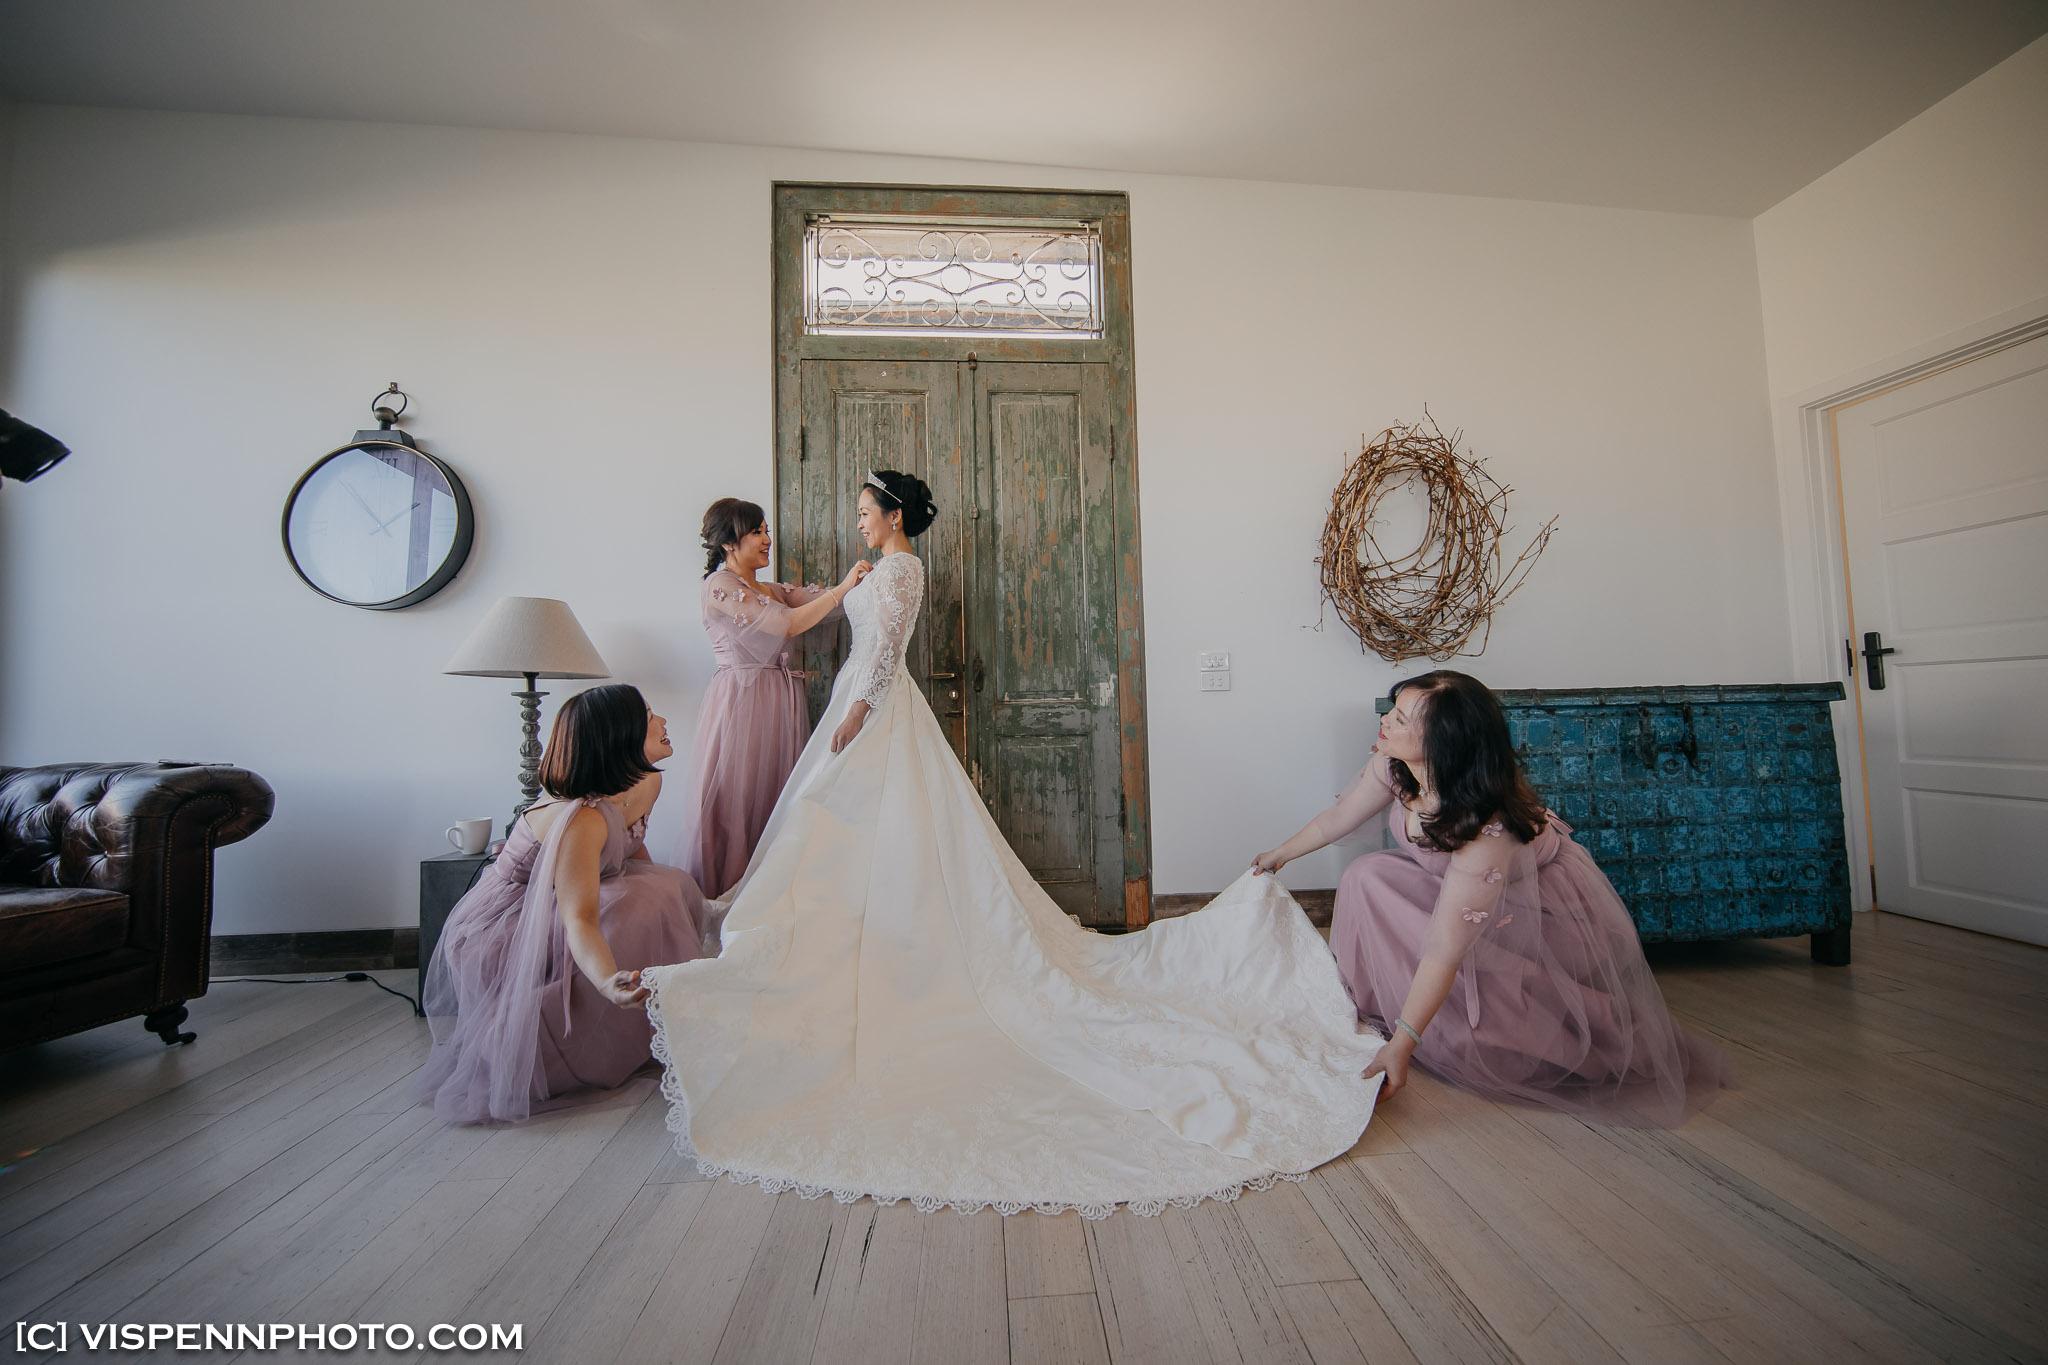 WEDDING DAY Photography Melbourne CoreyCoco 2P 05793 5D4 ZHPENN